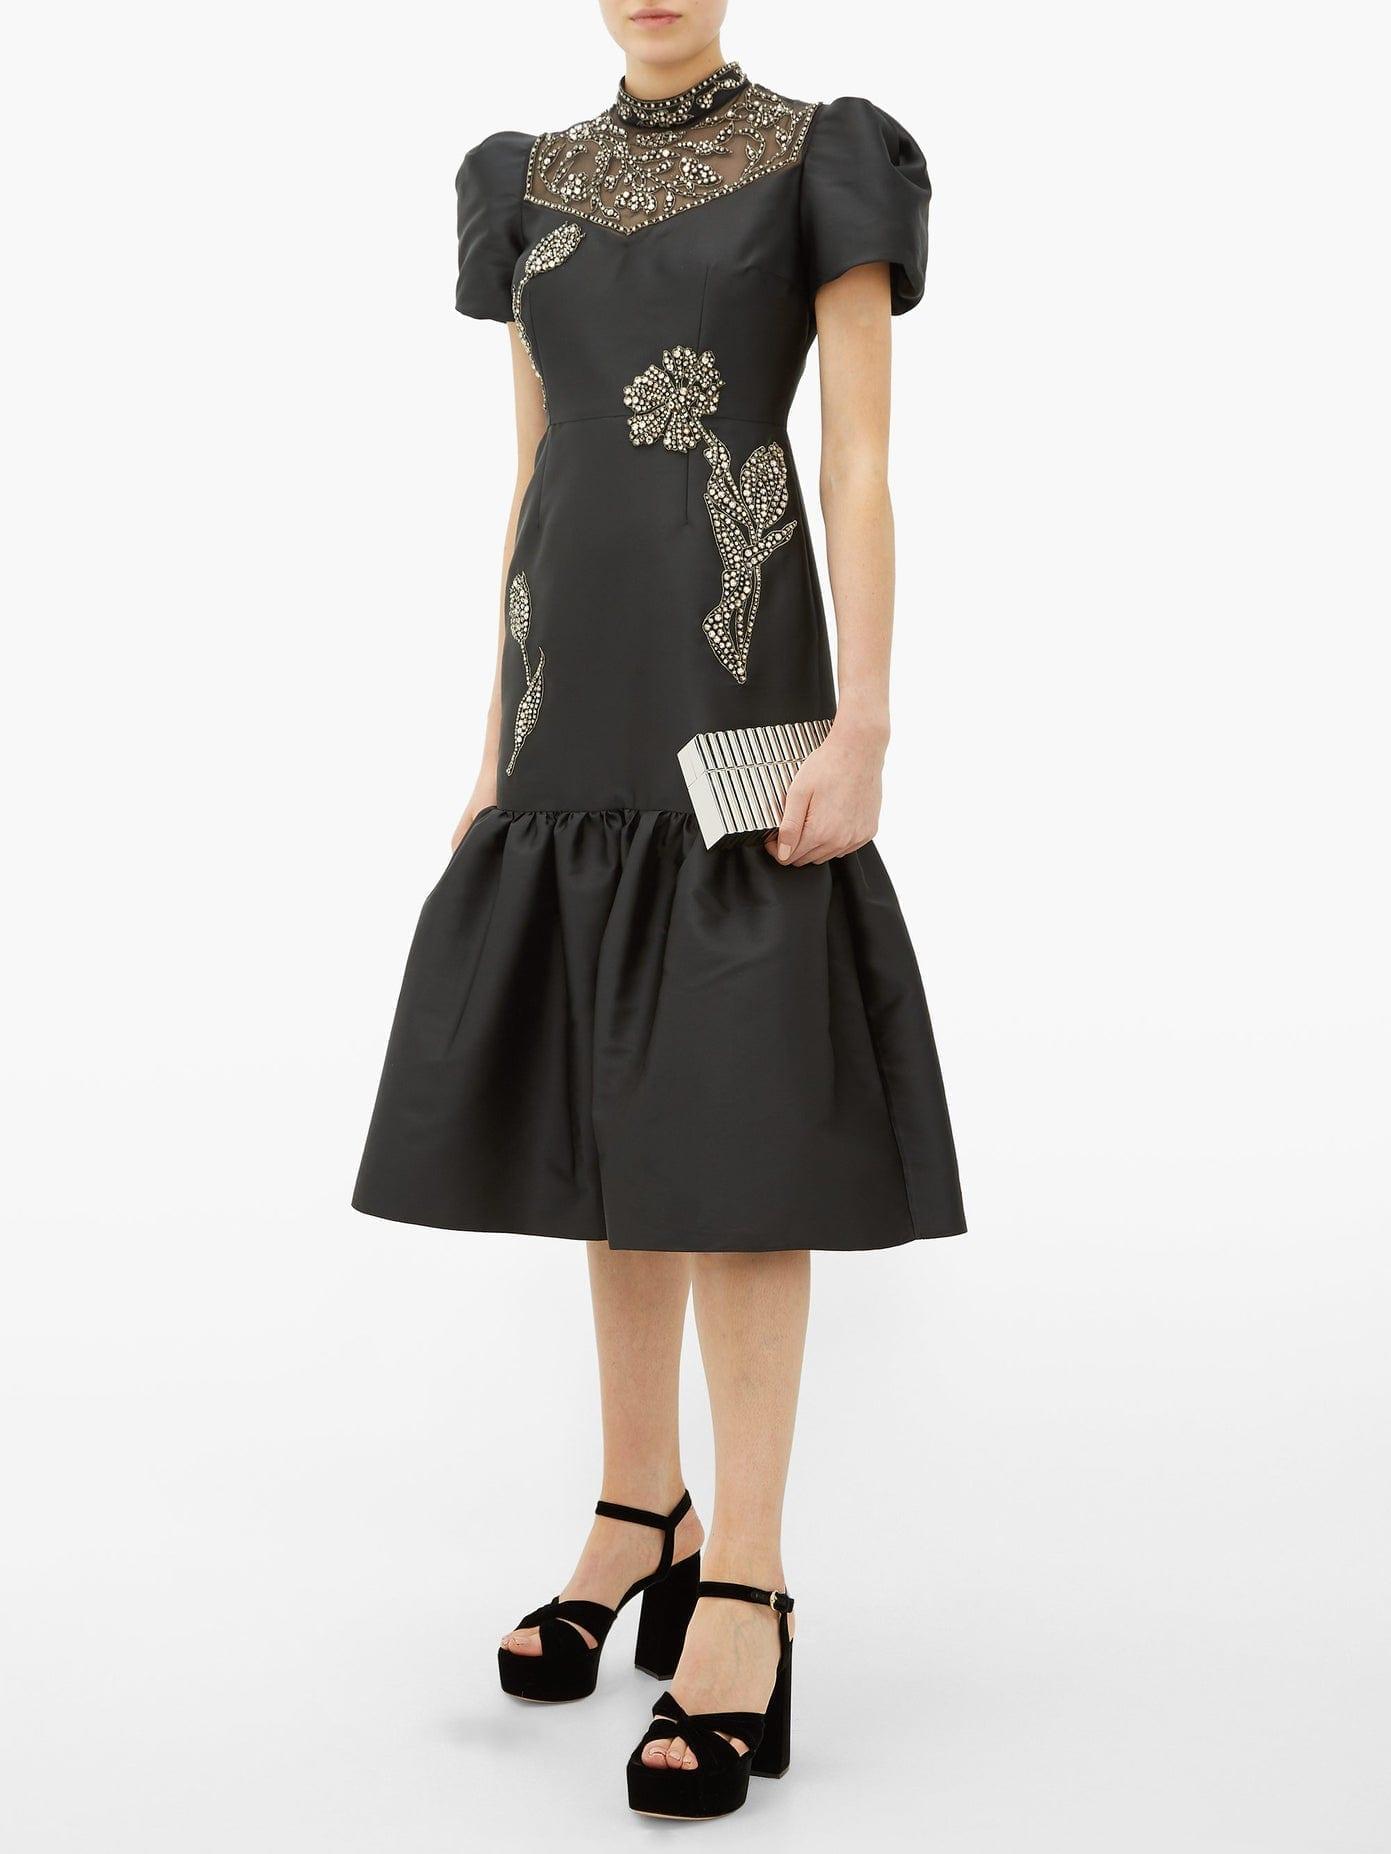 ERDEM Valetta Crystal-Embellished Mikado Dress